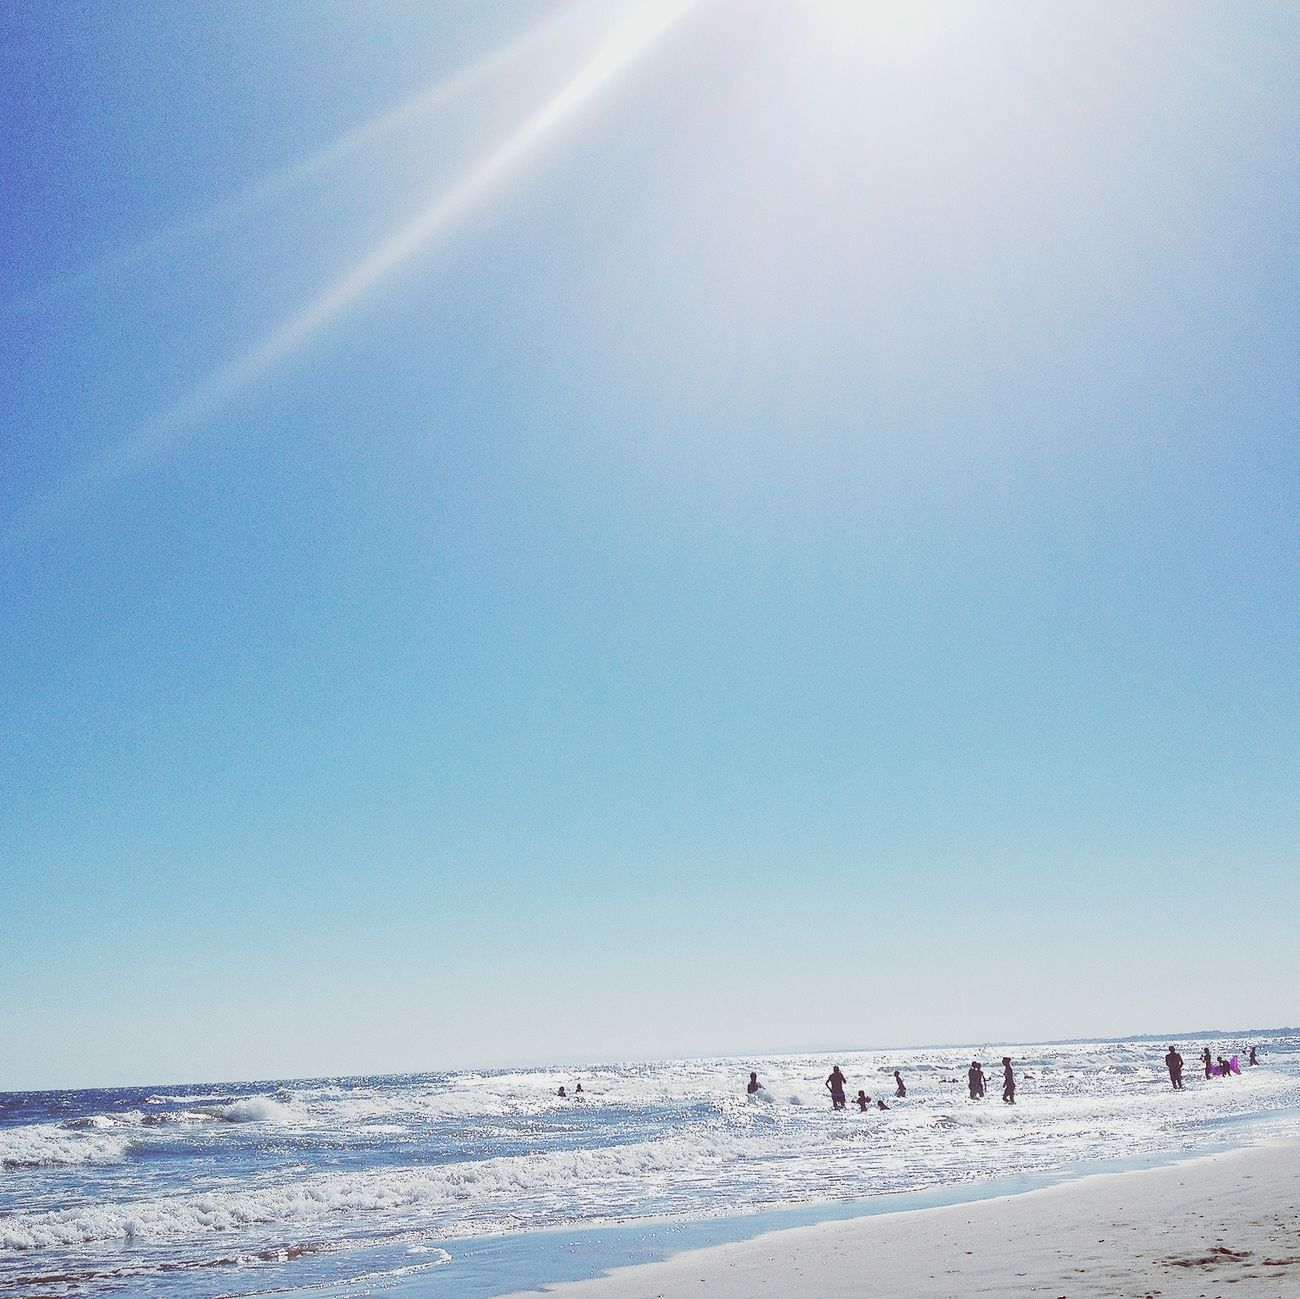 Cap d'Agde ❤ France Summer 2013 Beach Bluesky